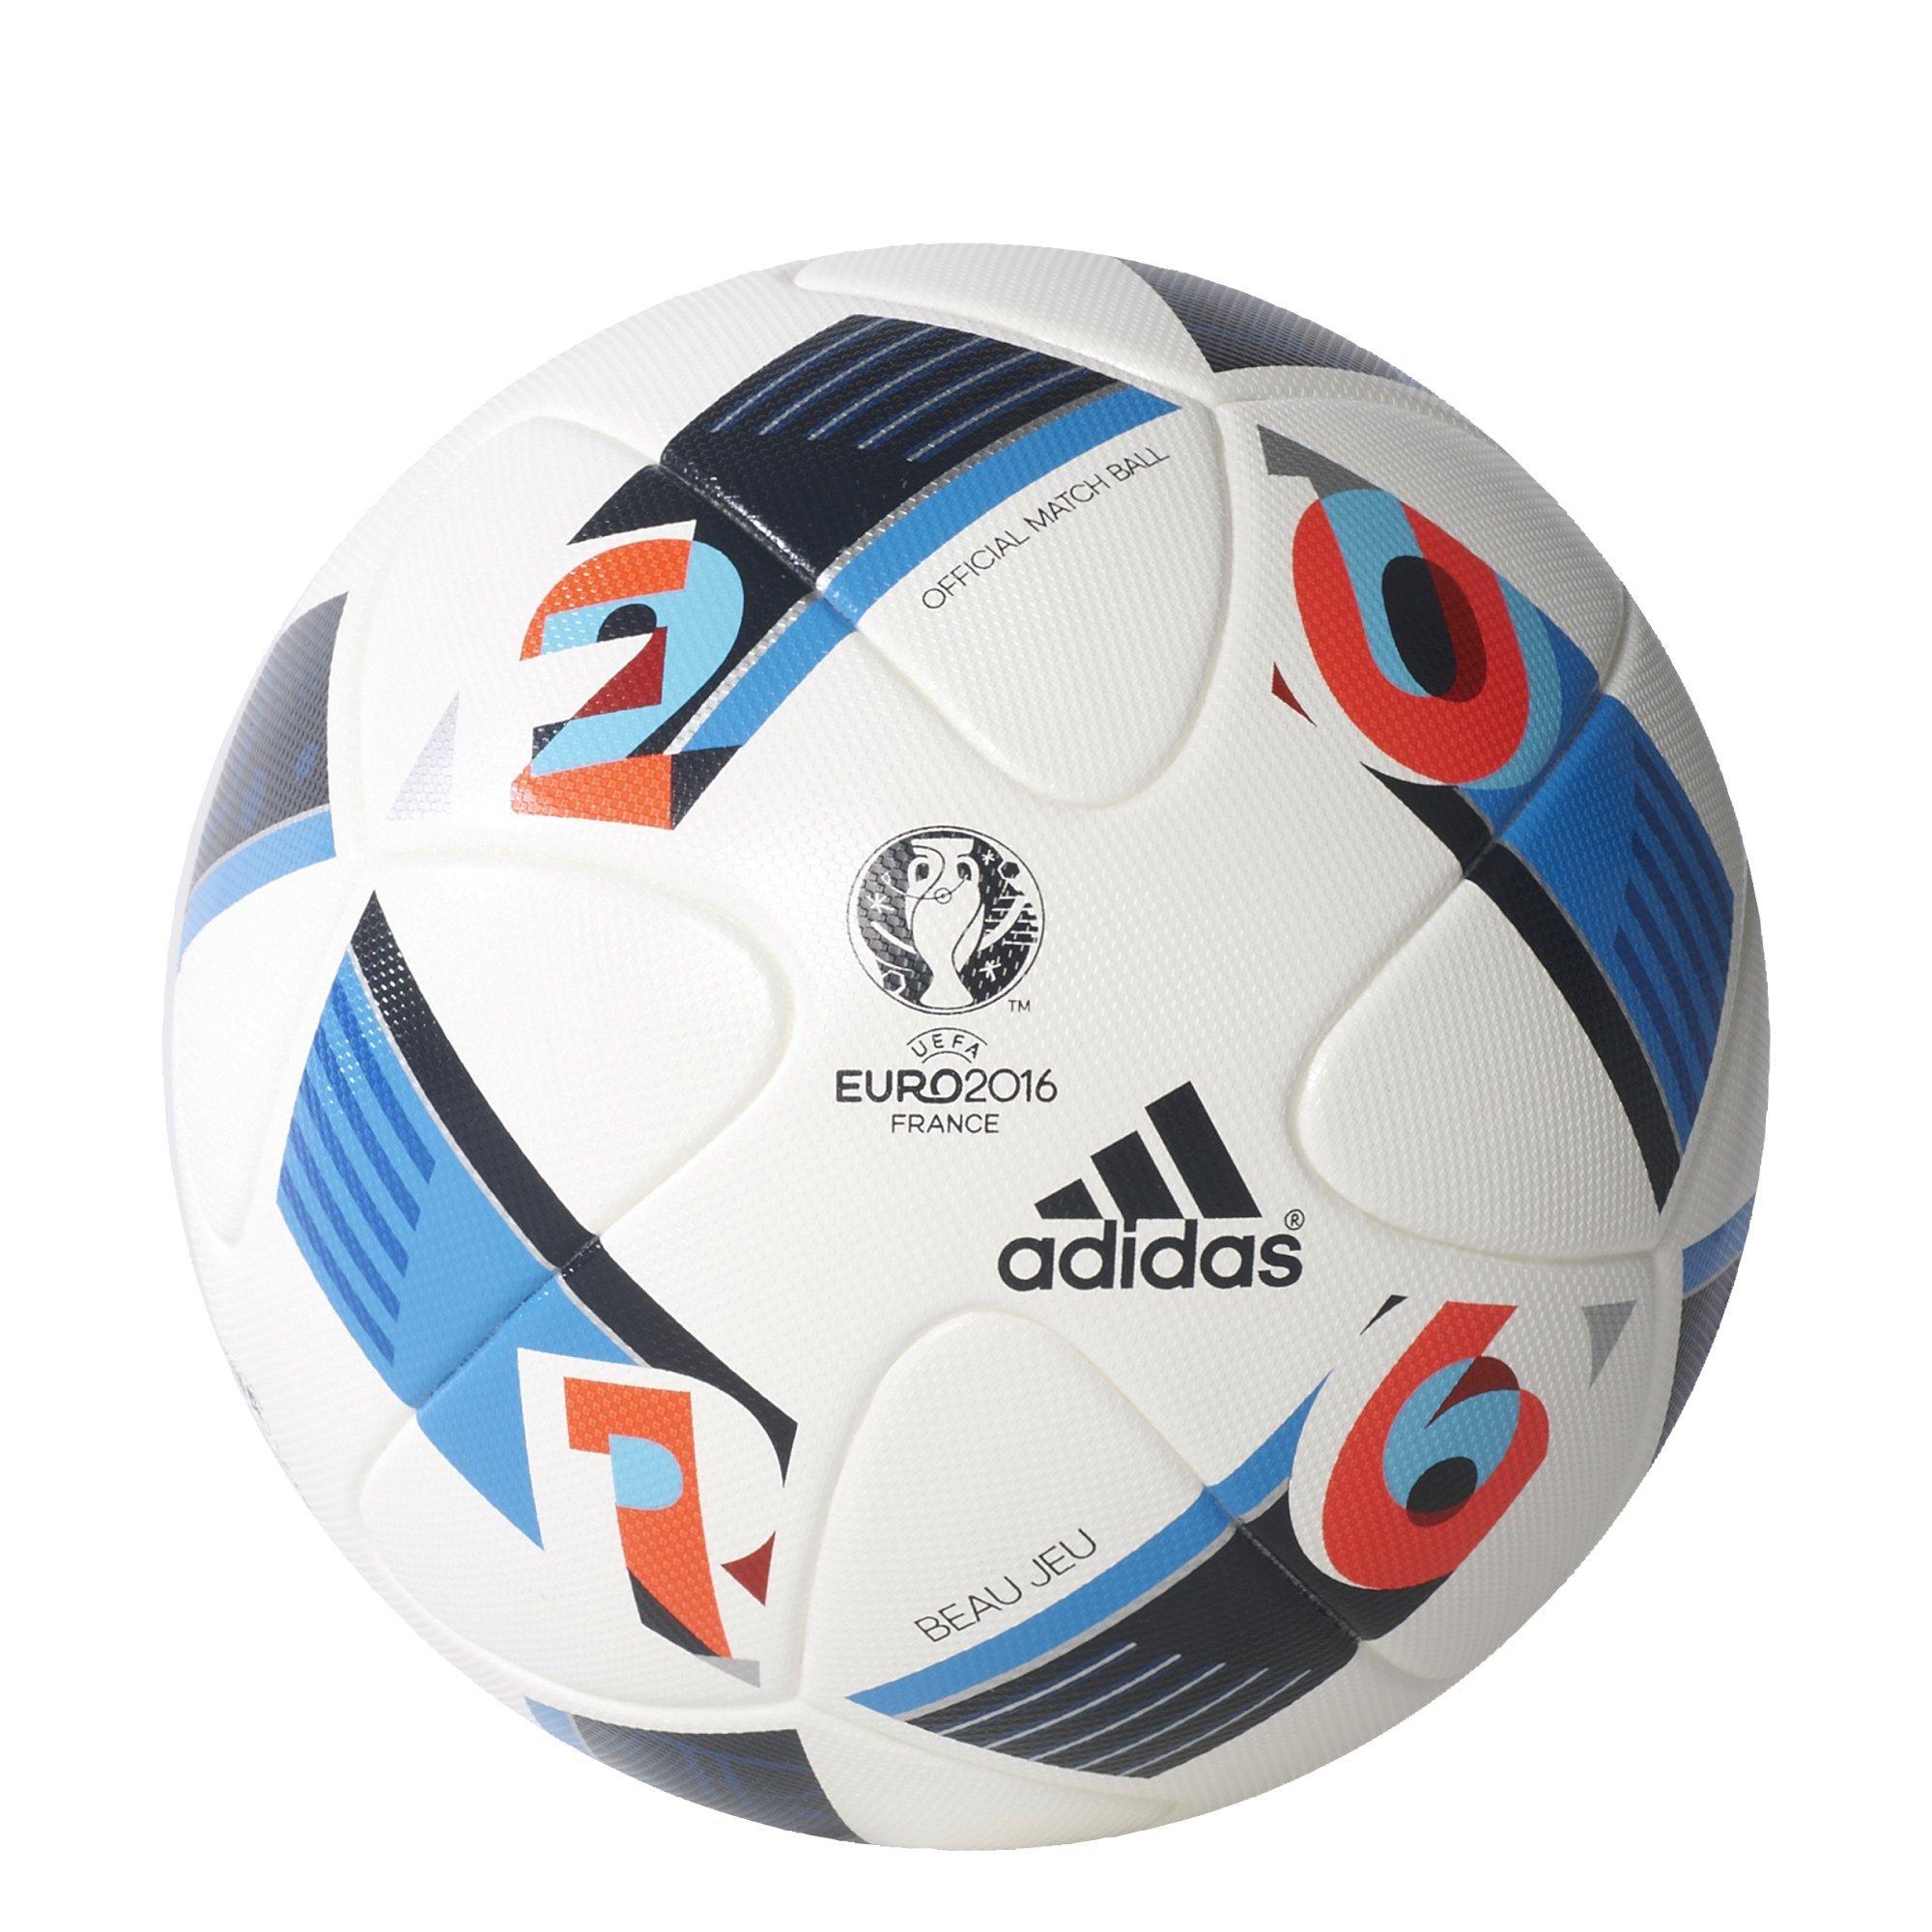 adidas Performance Euro 16 Official Match Soccer Ball, White/Bright Blue/Night Indigo, 5